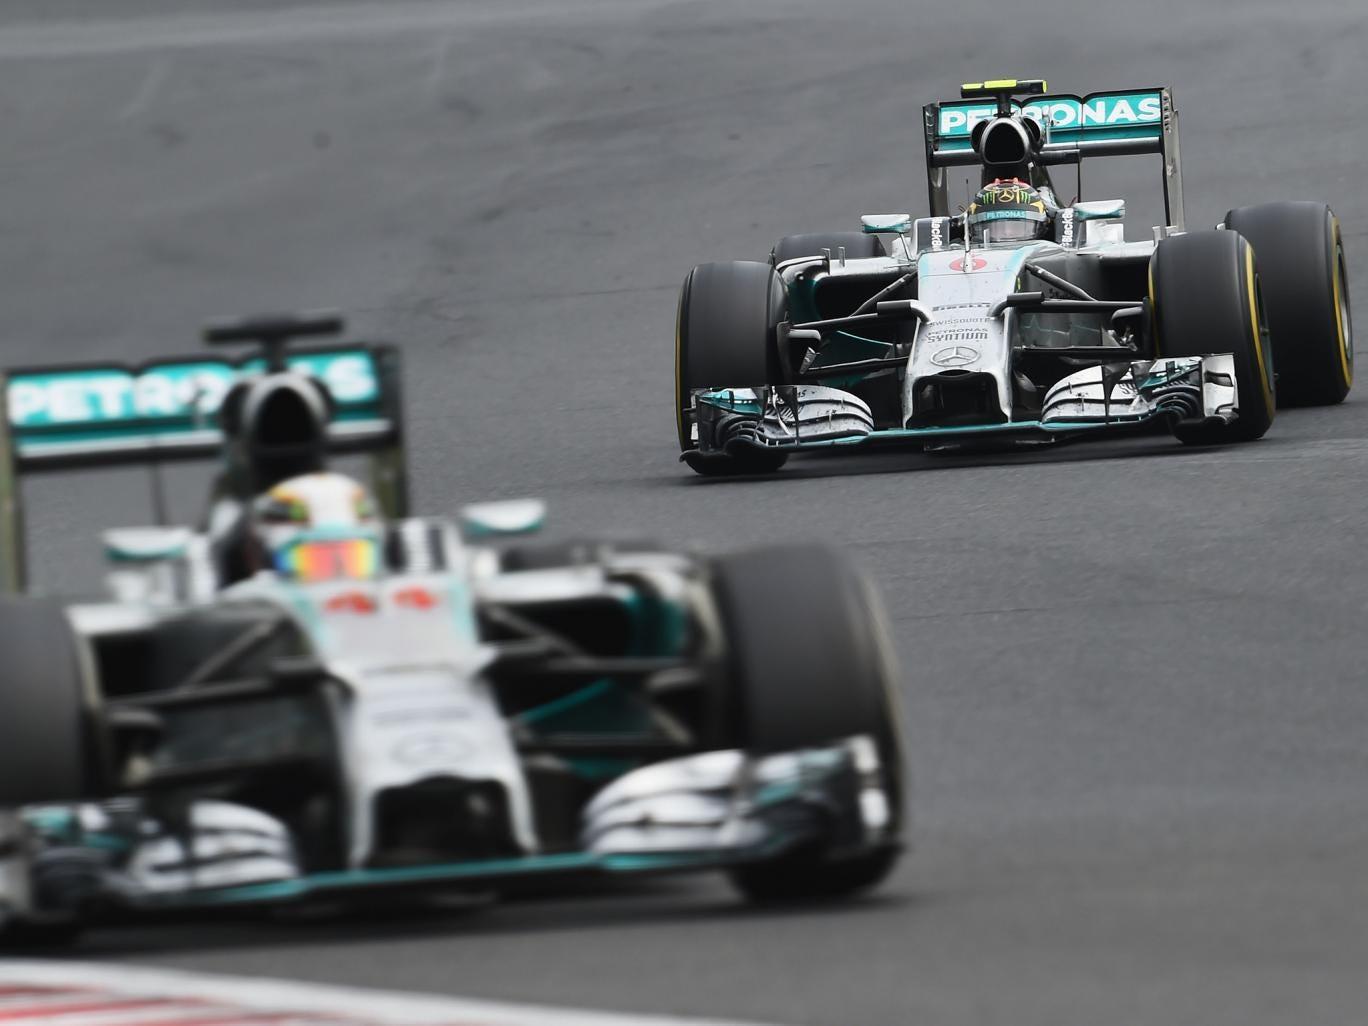 Lewis Hamilton pictured ahead of Nico Rosberg